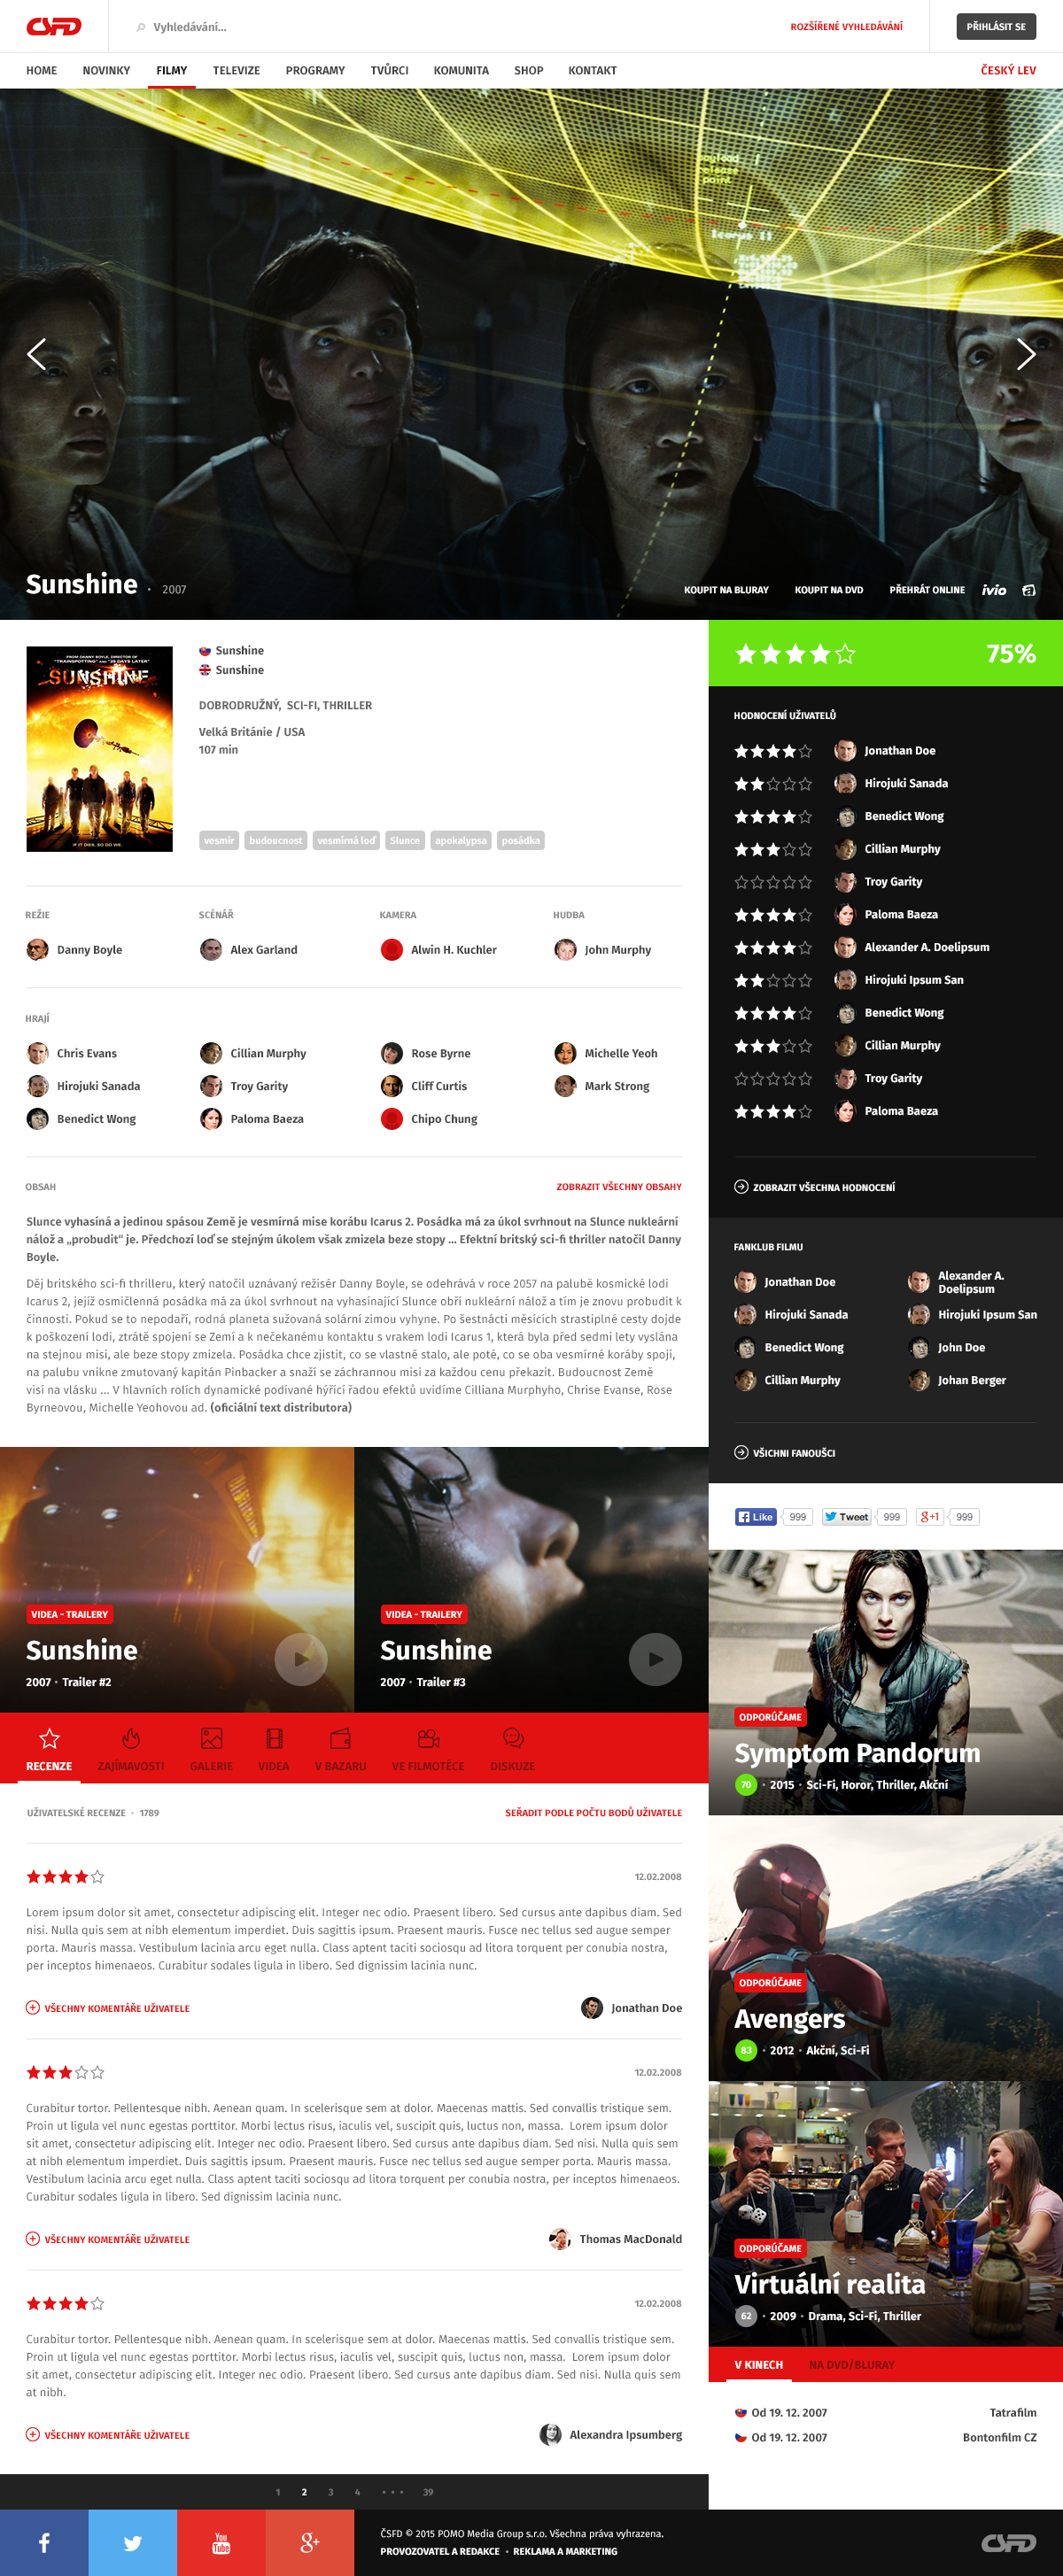 Csfd redesign movie review